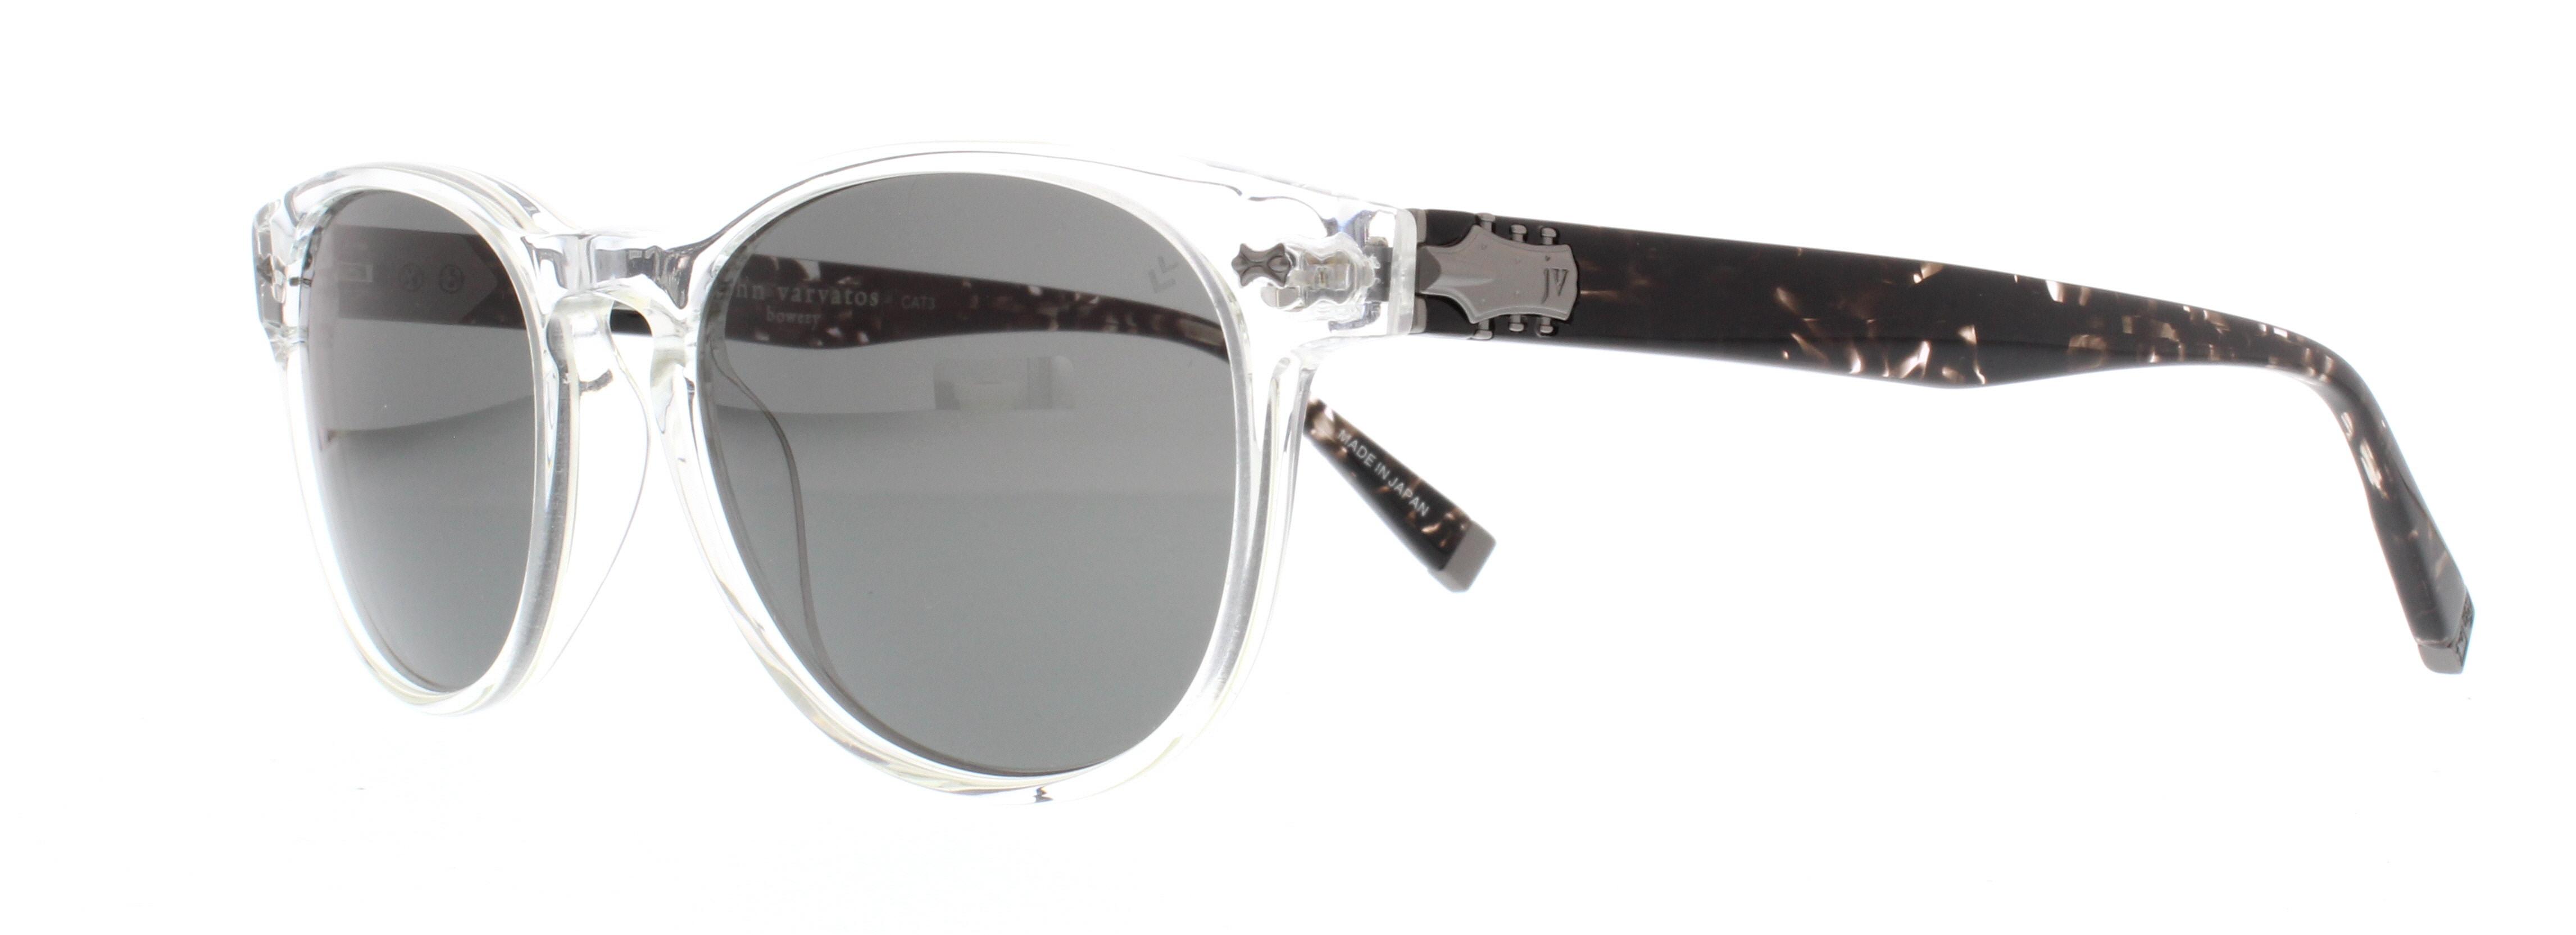 78a54432c8 JOHN VARVATOS Sunglasses V774 Crystal 51MM 751286221008